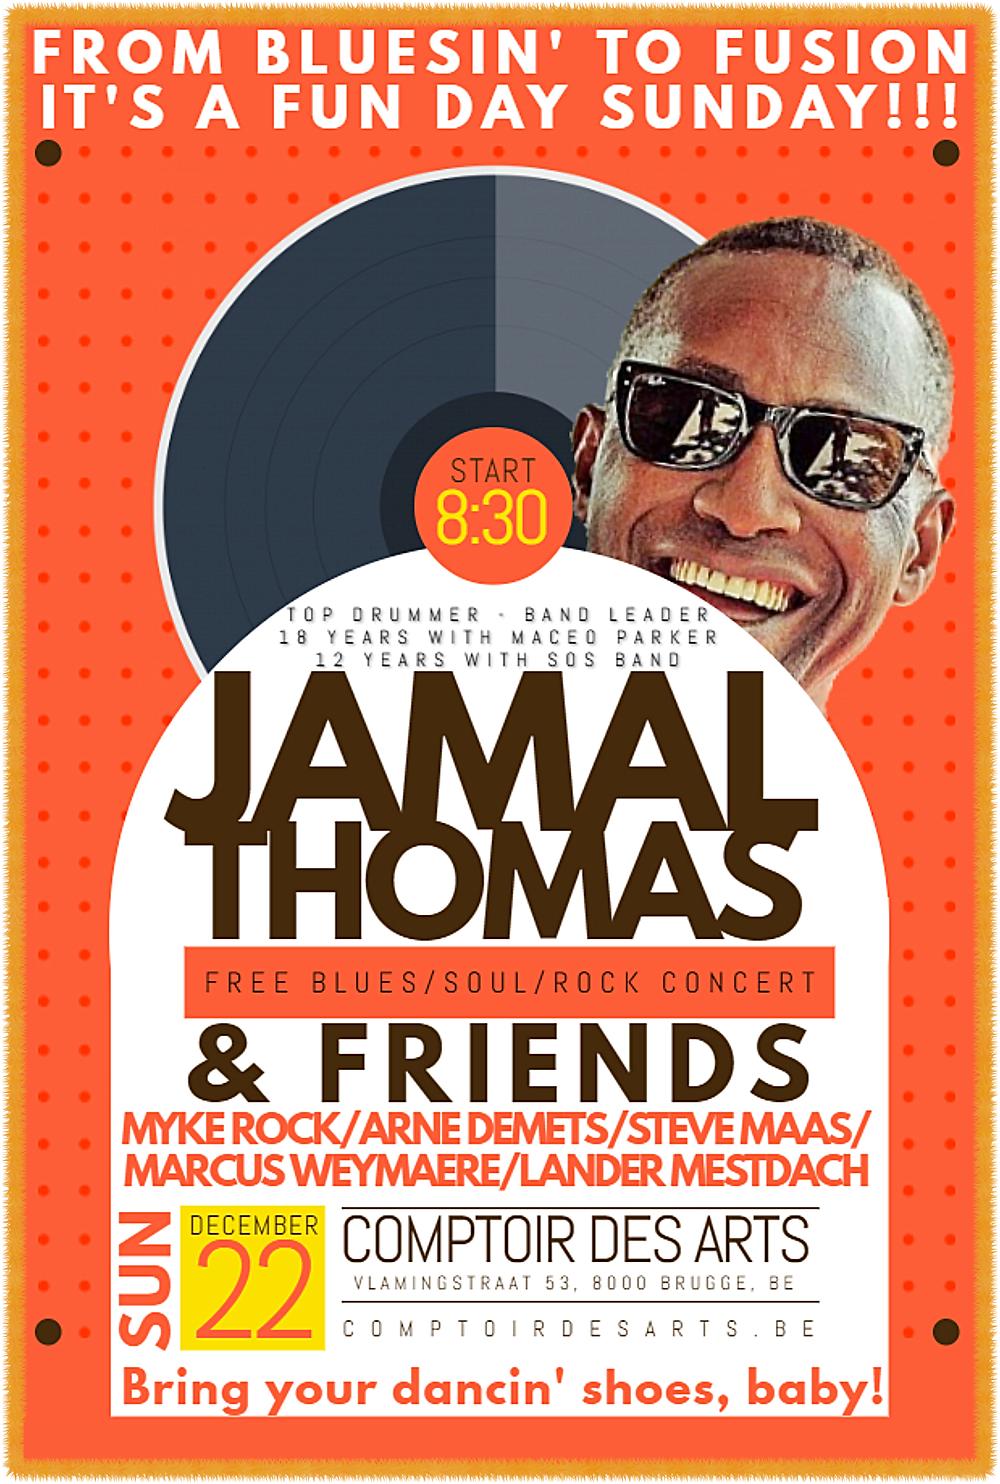 Jamal Thomas & Friends LIVE at Comptoir Des Arts Sunday, December 22, 2019!